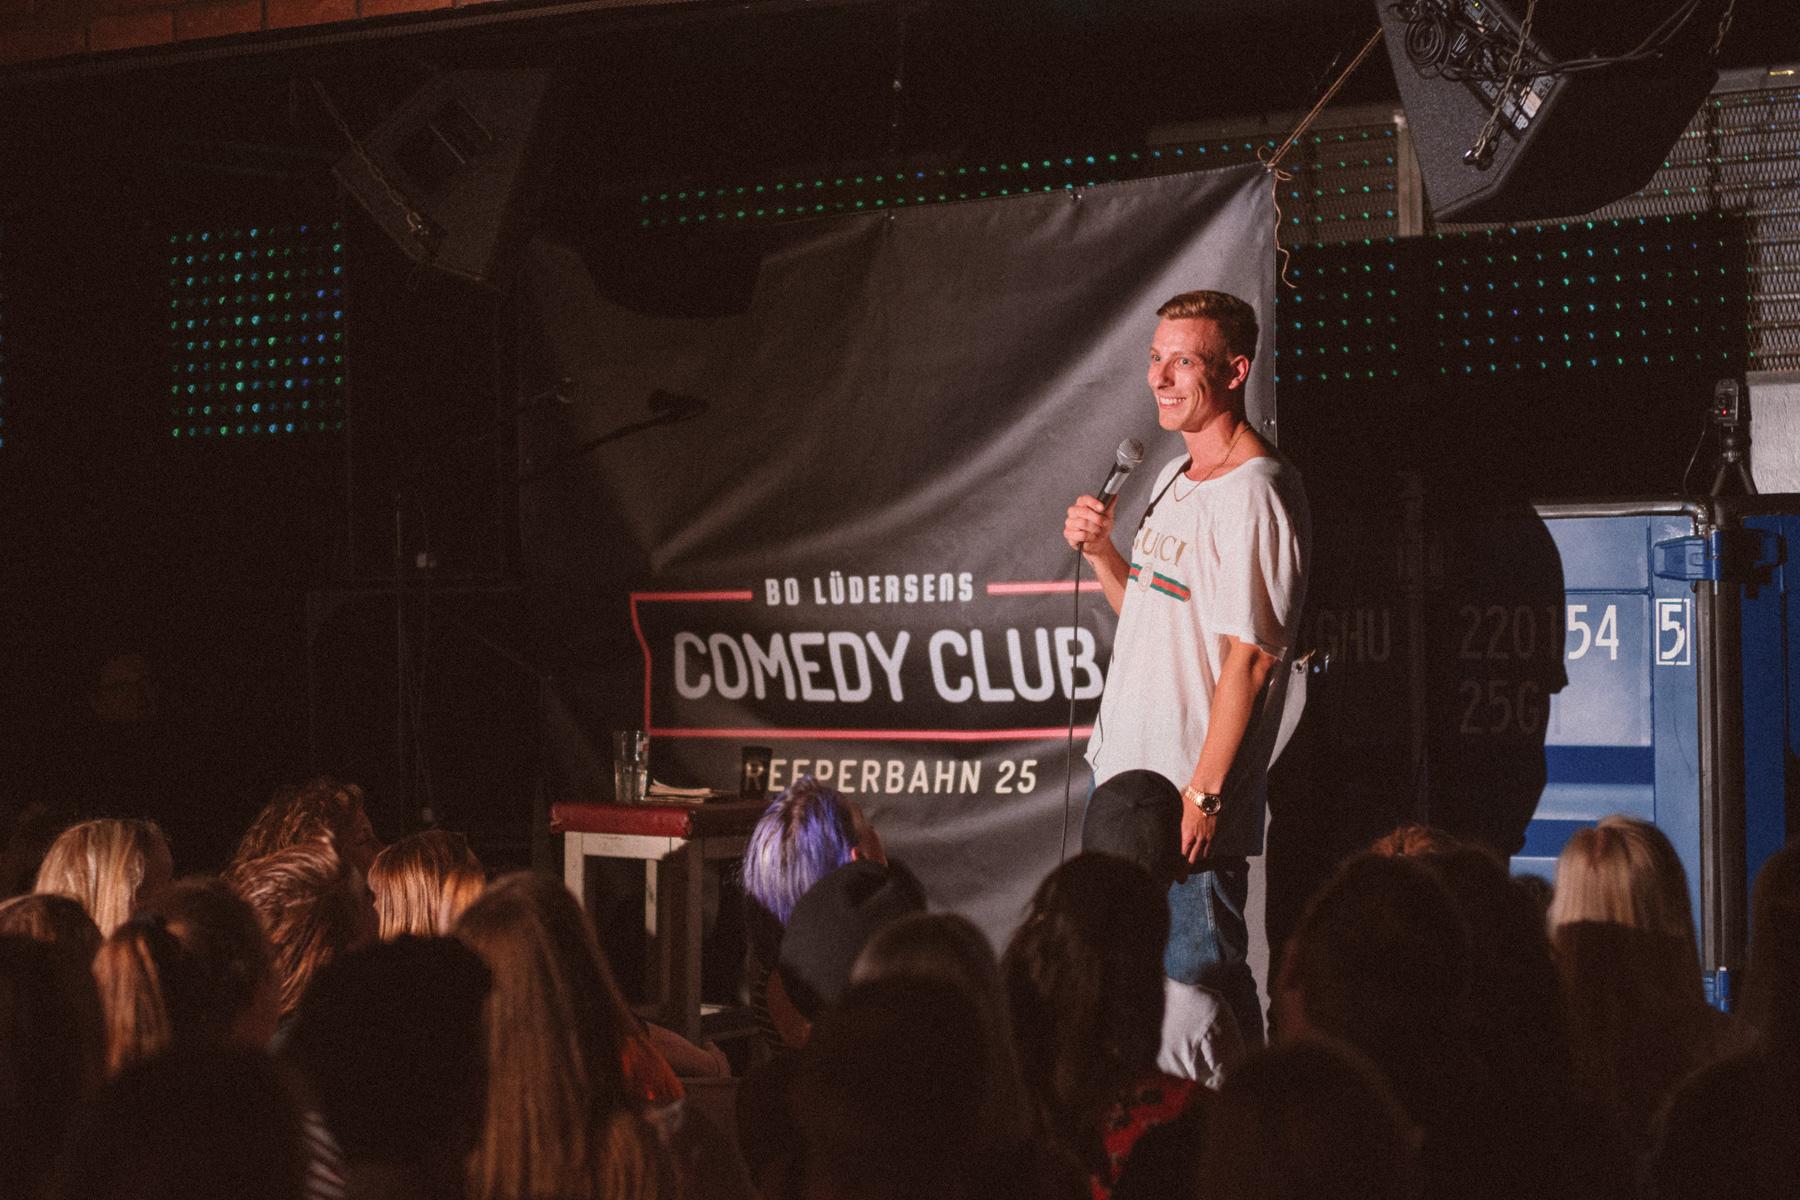 Reeperbahn Comedy Club Felix Lobrecht